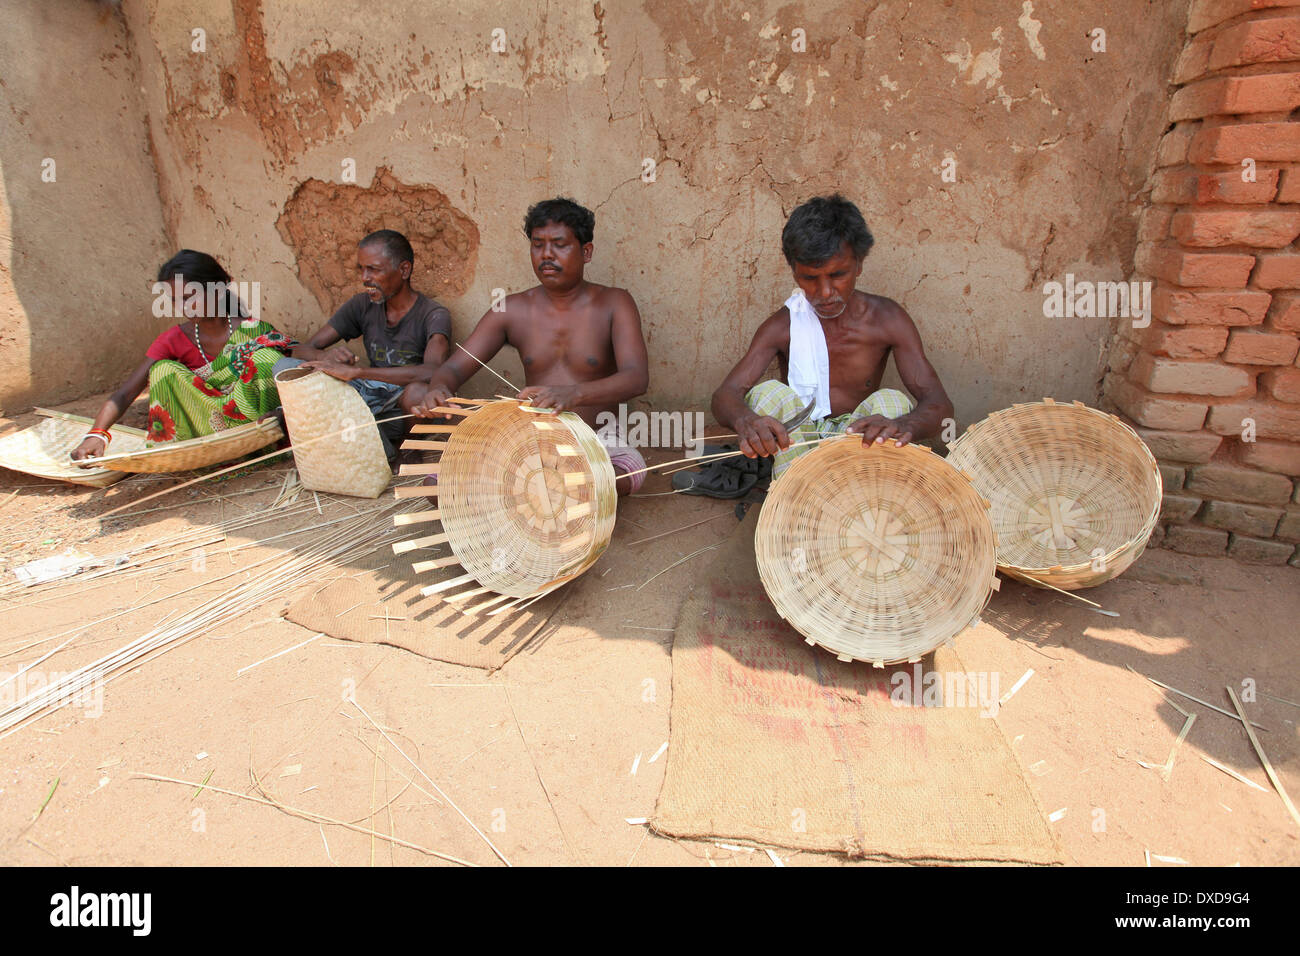 Tribal artisans making baskets with dry bamboo strips. Uraov tribe. Baludih village, Bokaro district, Jharkhand, India - Stock Image